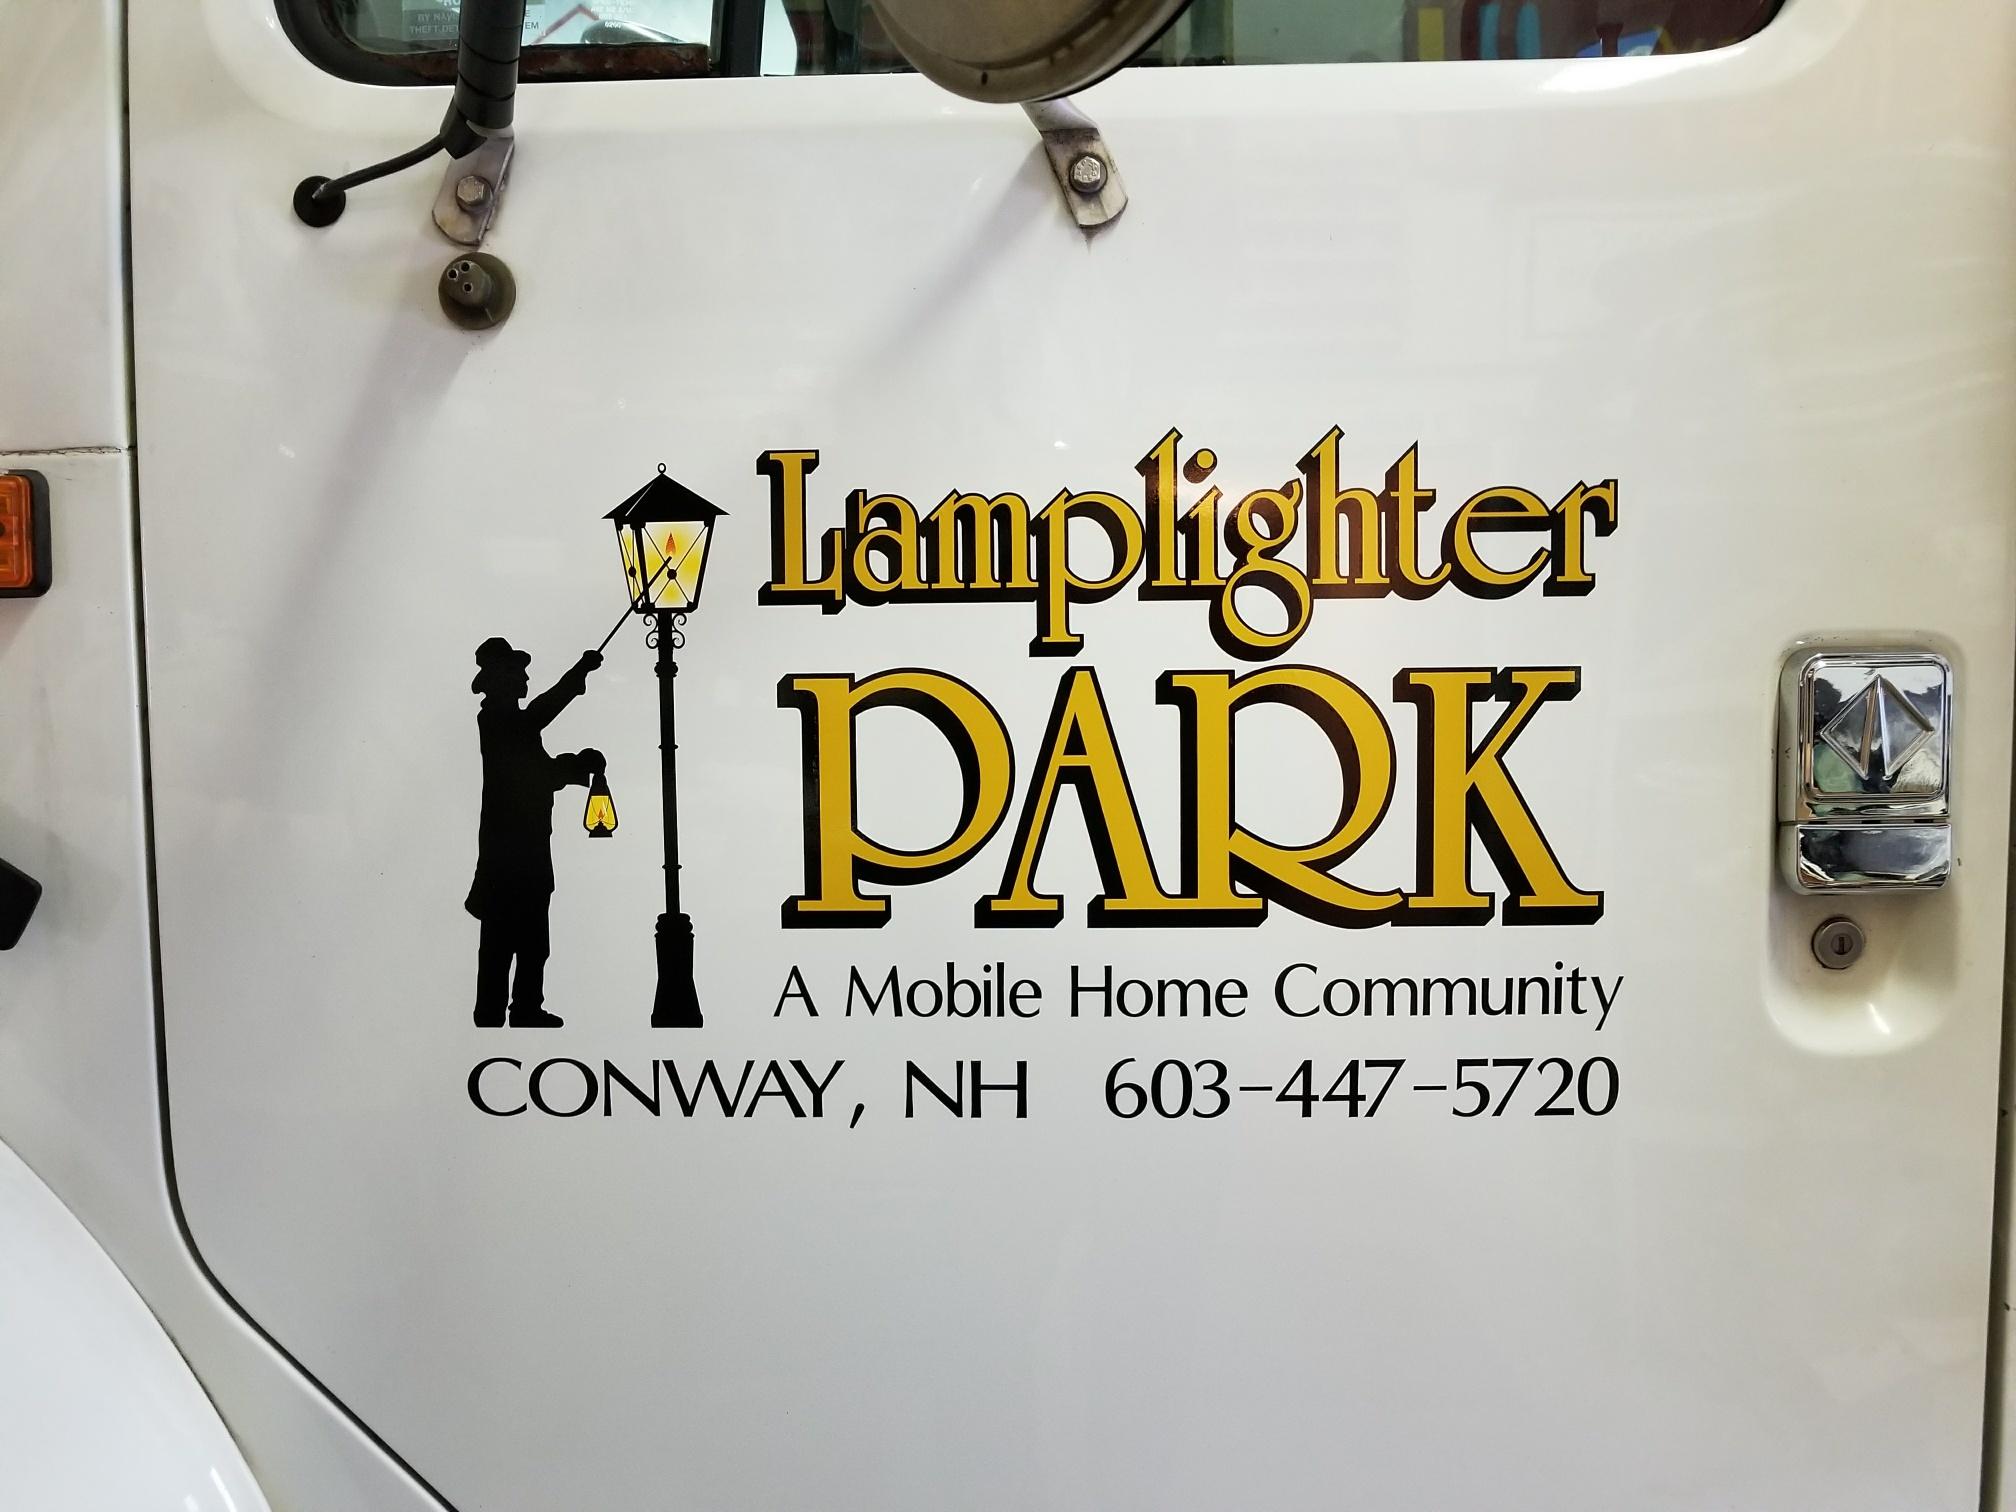 Lamplighter truck photo